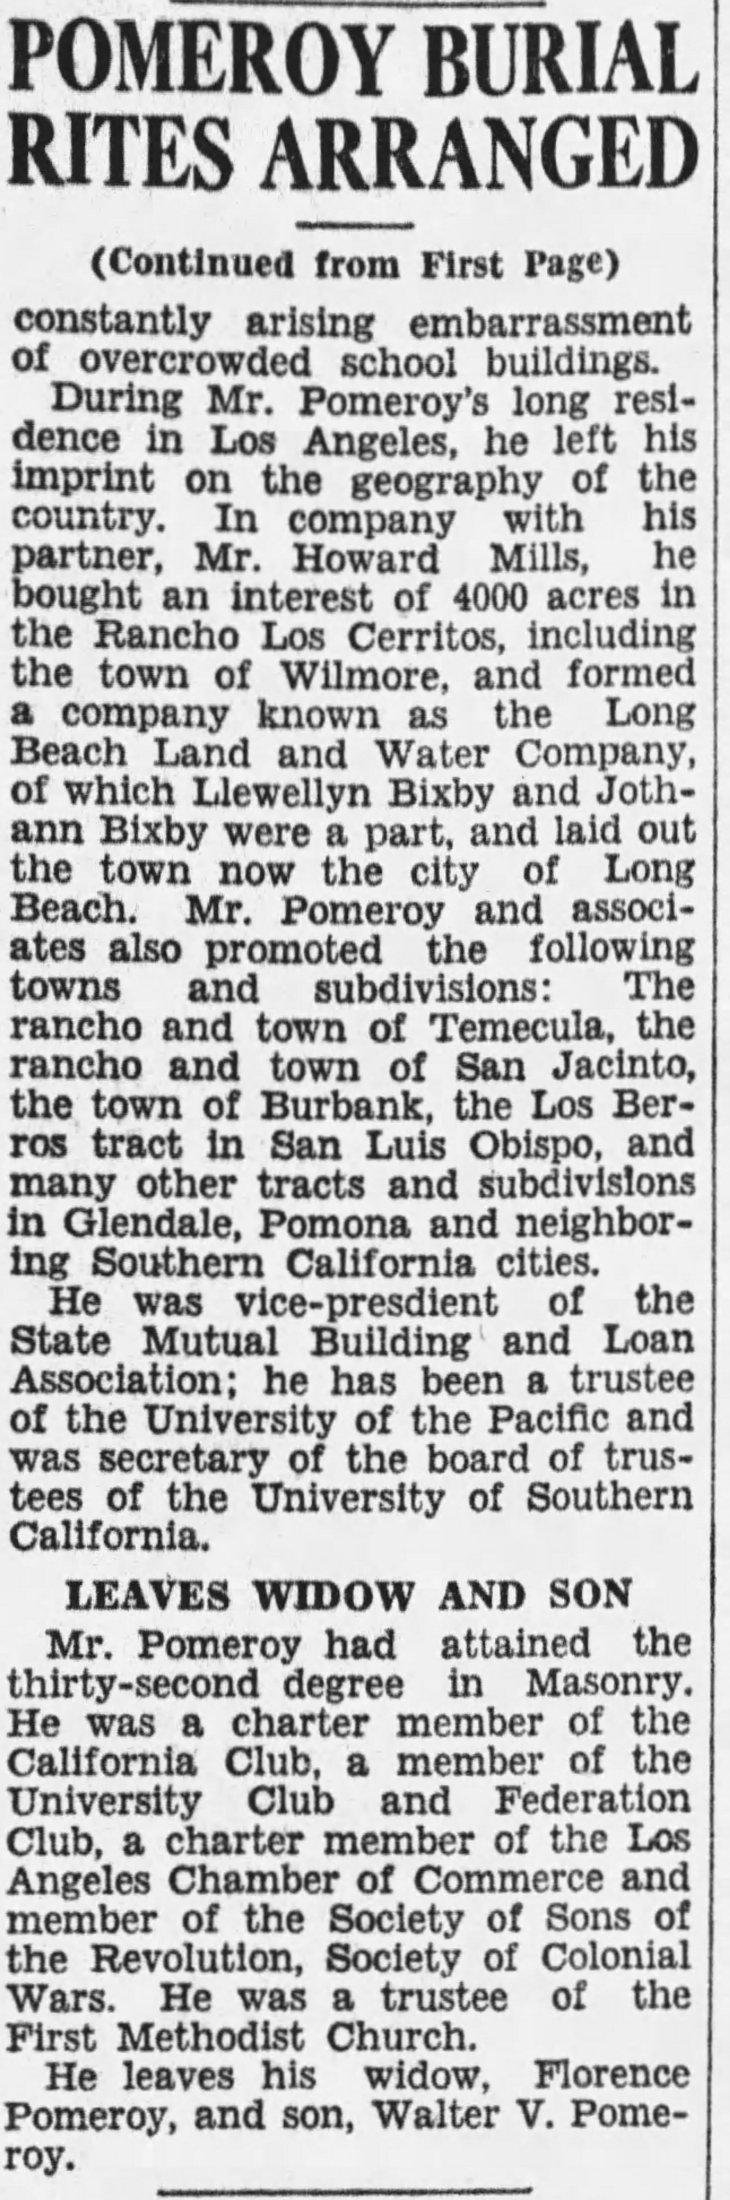 Obit p2 The_Los_Angeles_Times_Fri__Mar_16__1928_ (1)